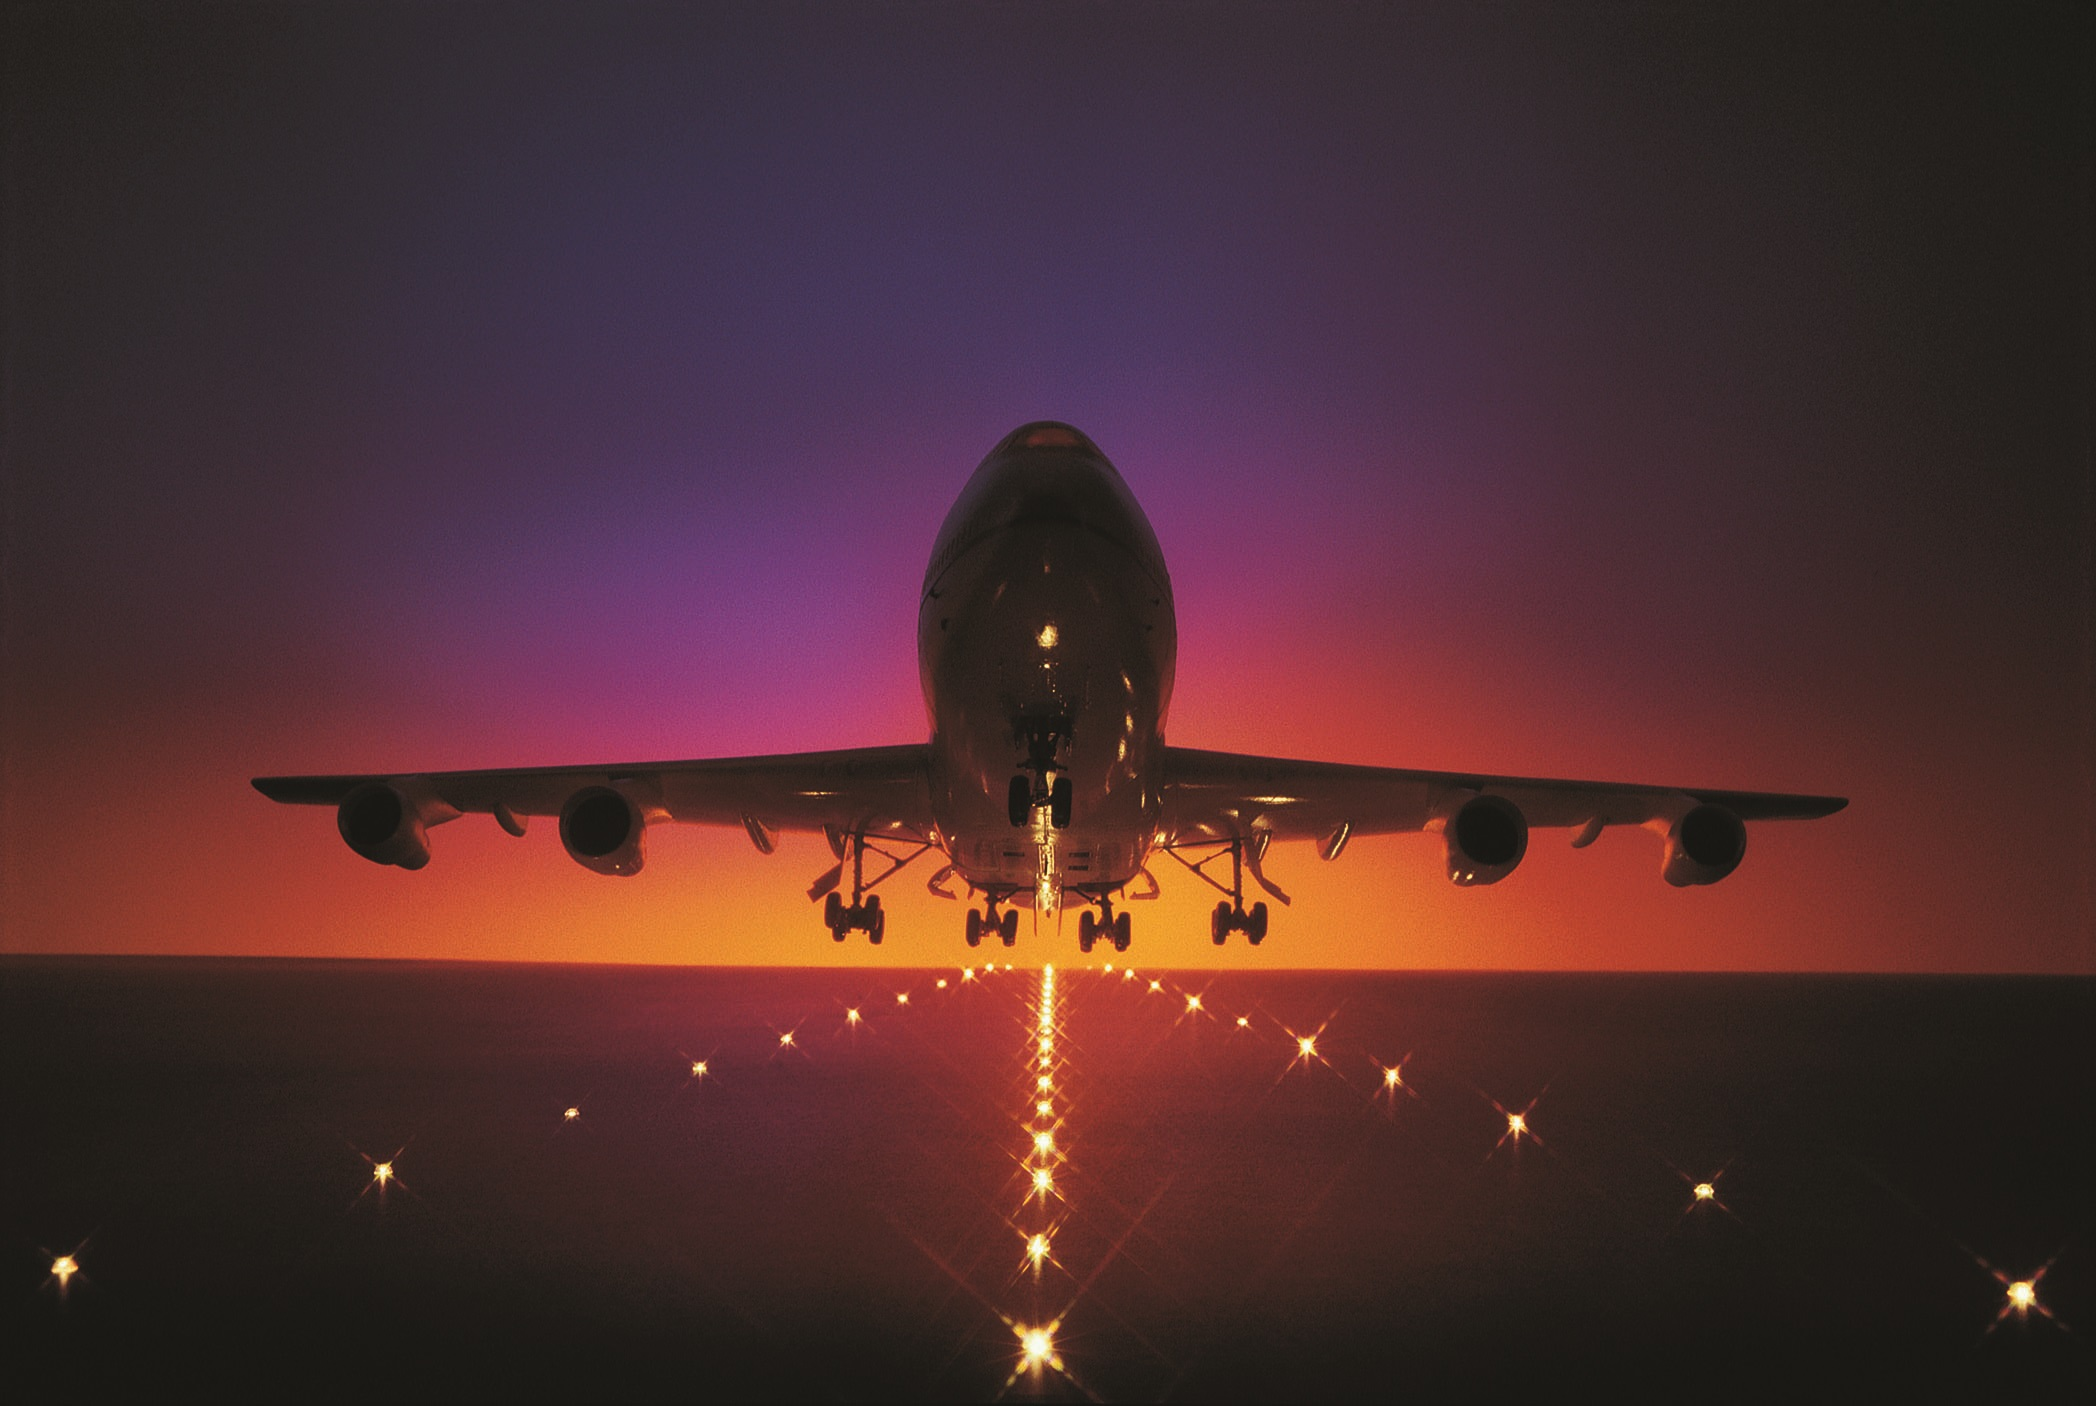 Sky Air Travel Agency